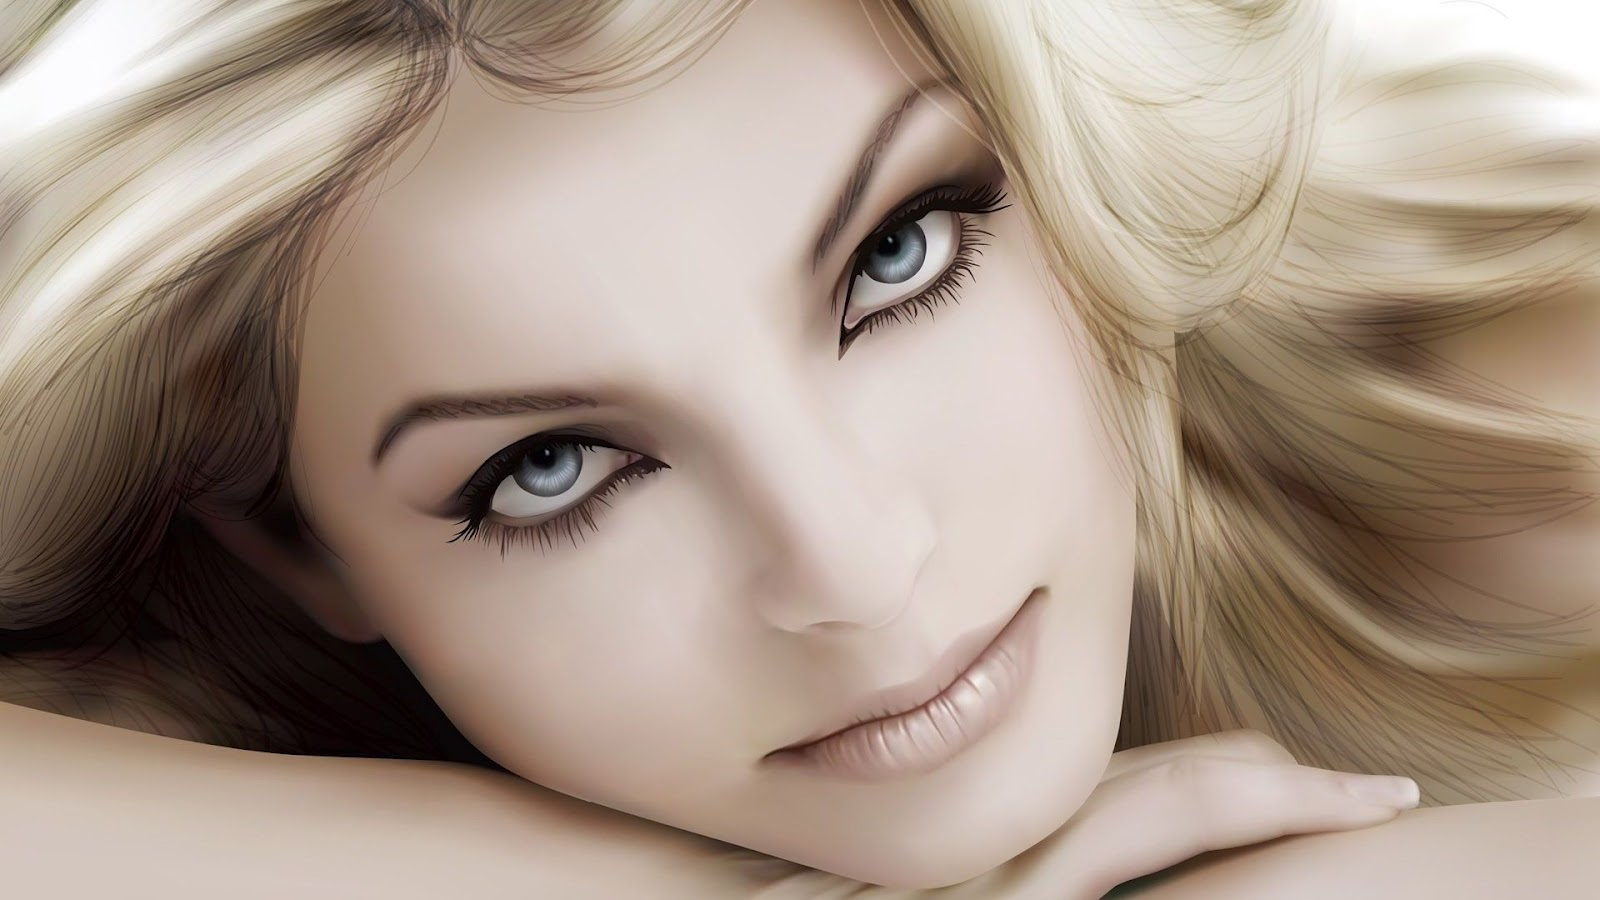 http://1.bp.blogspot.com/-oeBFZu17XbM/T6qcY62XNvI/AAAAAAAAAYM/DvgBstgYrsI/s1600/beautiful-face-girls-wallpapers-backgrounds-1920x1080.jpg